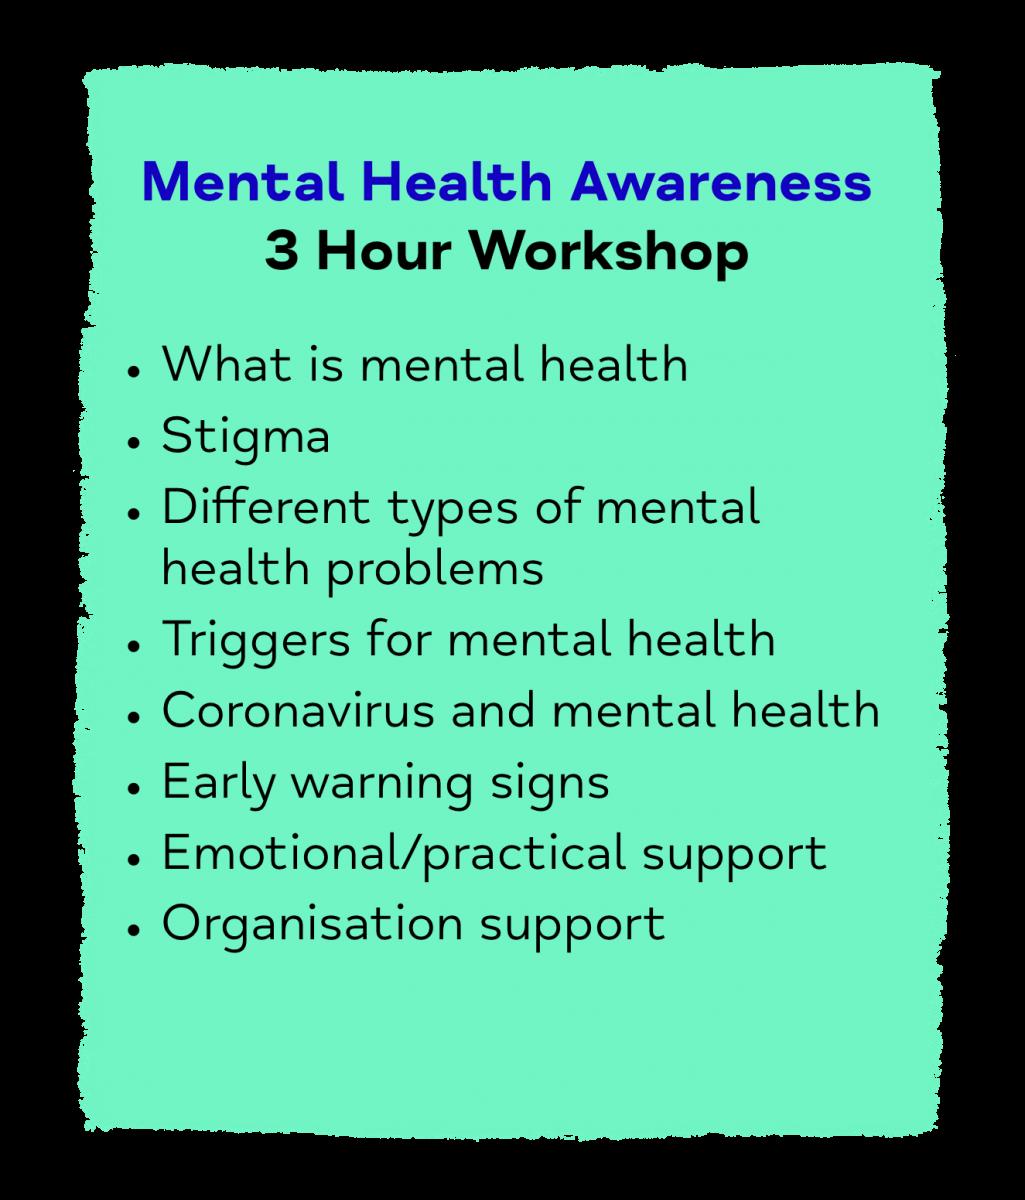 Mental Health Awareness 3 Hour Workshop